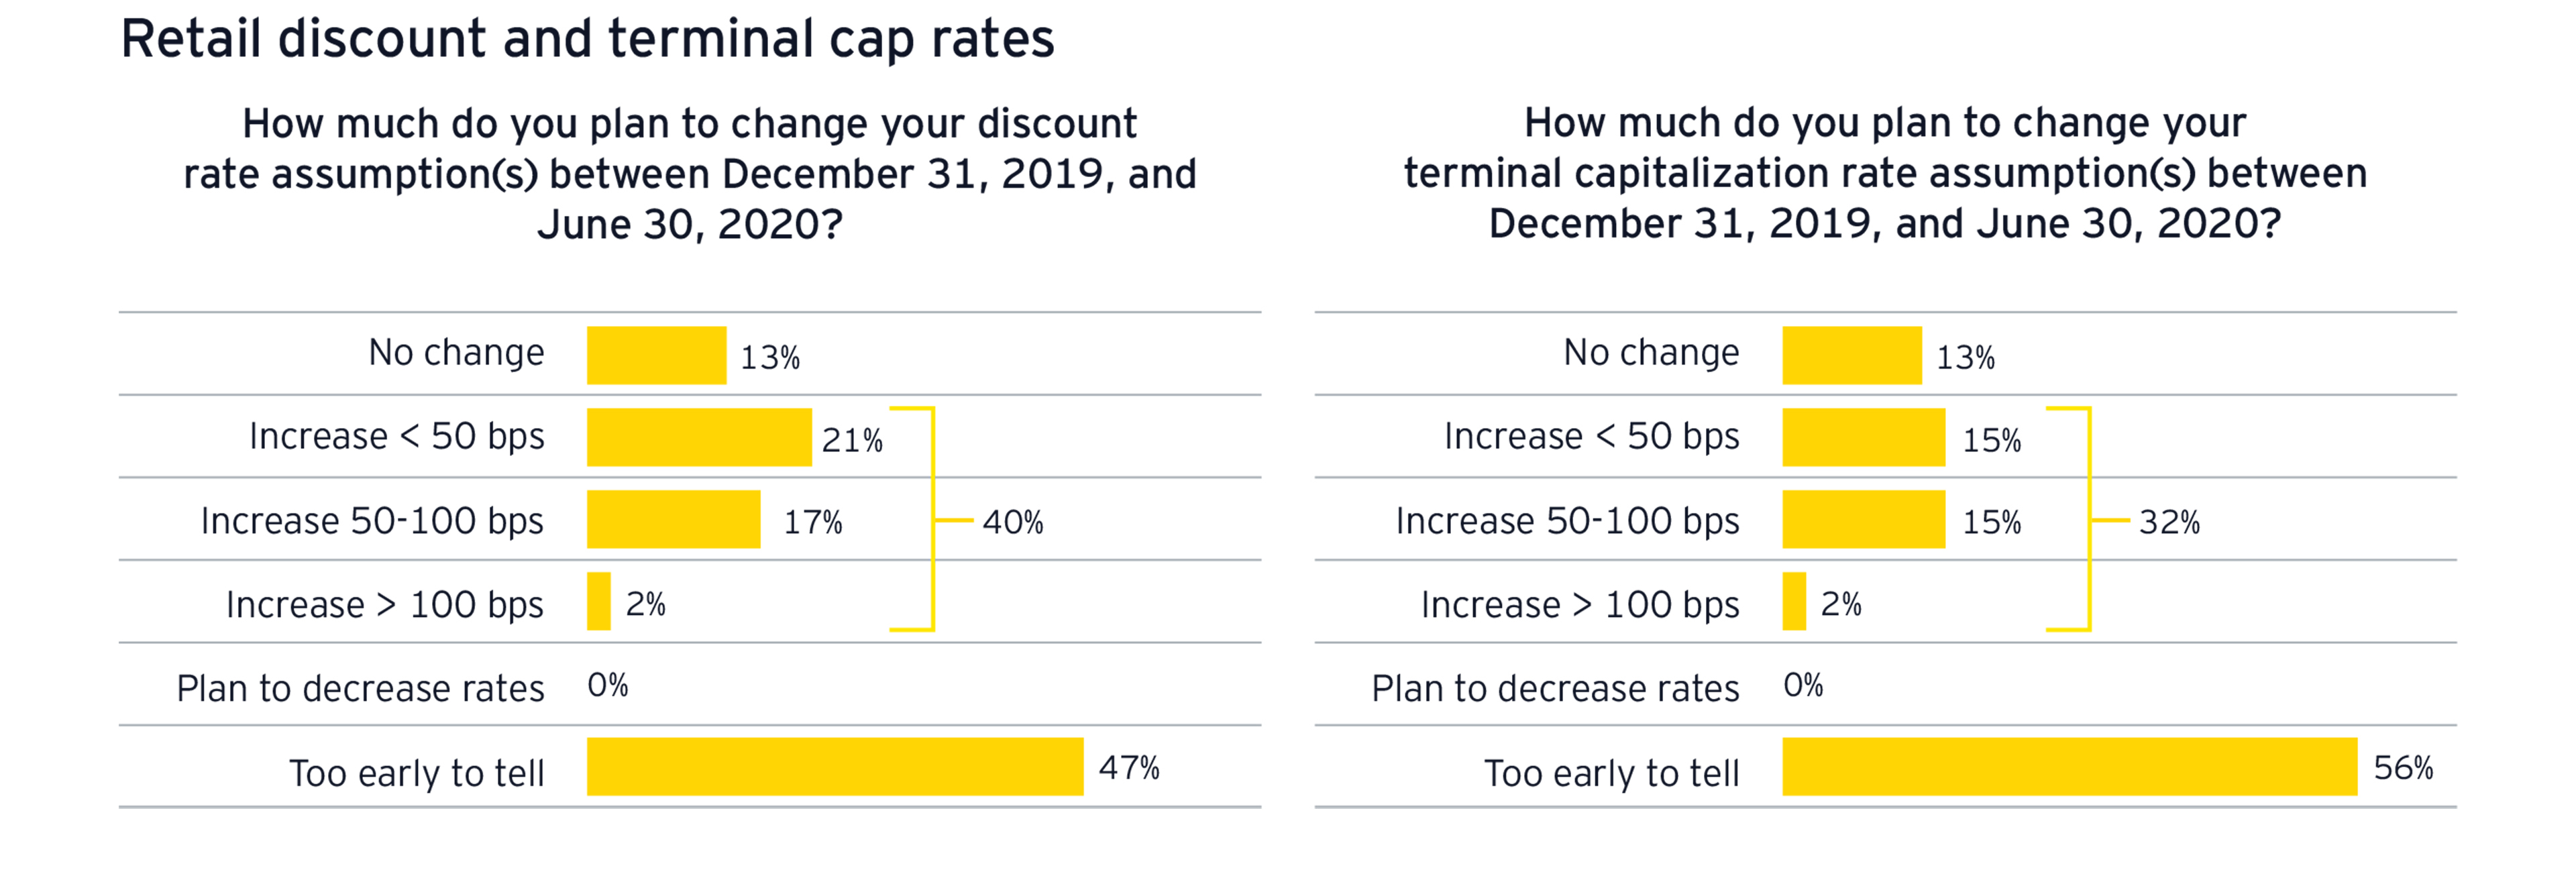 Retail discount and terminal cap rates